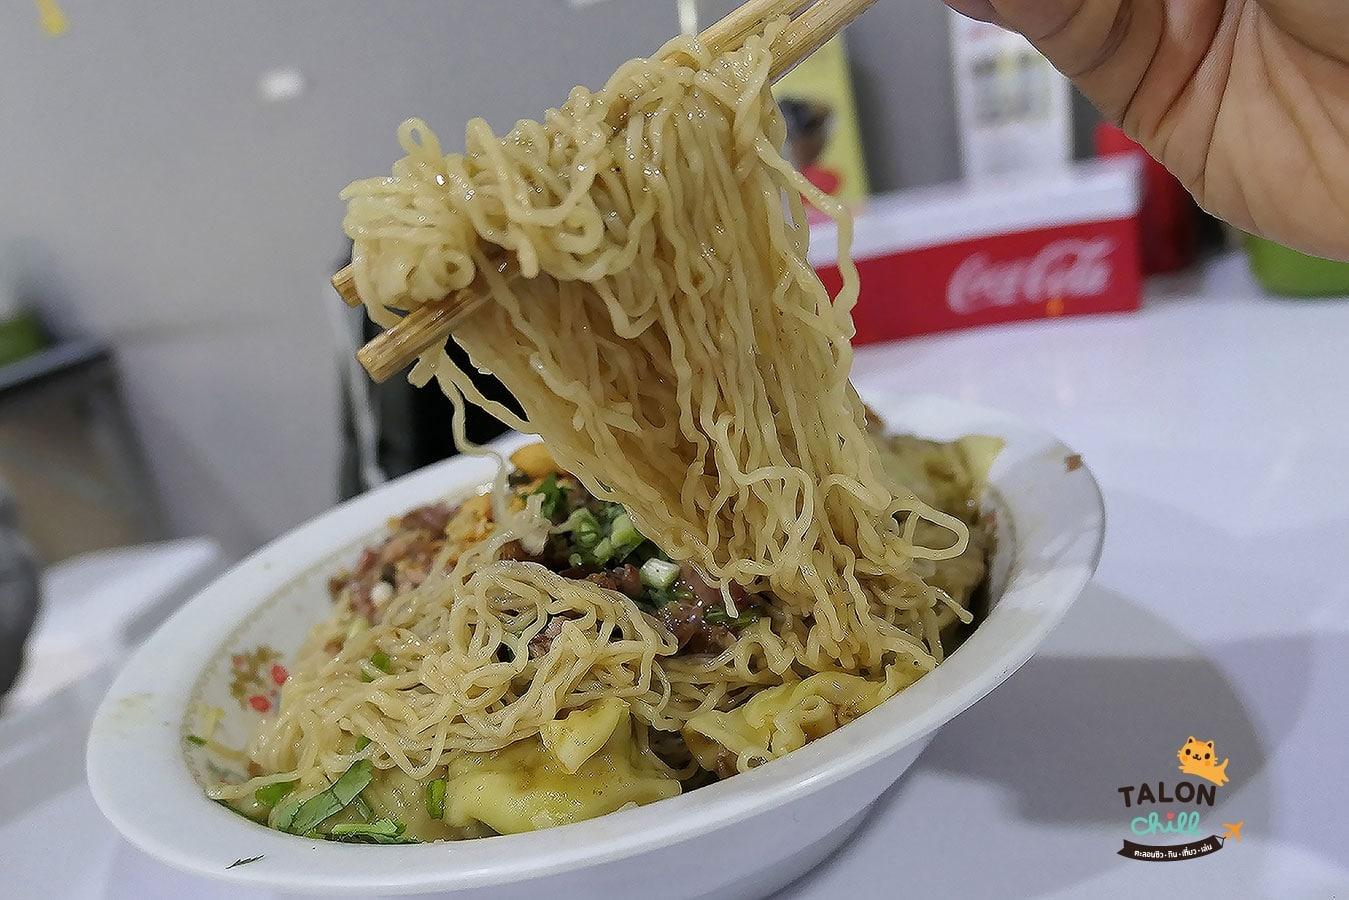 [Review] ร้านบะหมี่ปราบเซียน สาขาที่ 3 ซ.ติวานนท์ 3 (พิชยนันท์) ใกล้รถไฟฟ้าสายสีม่วง